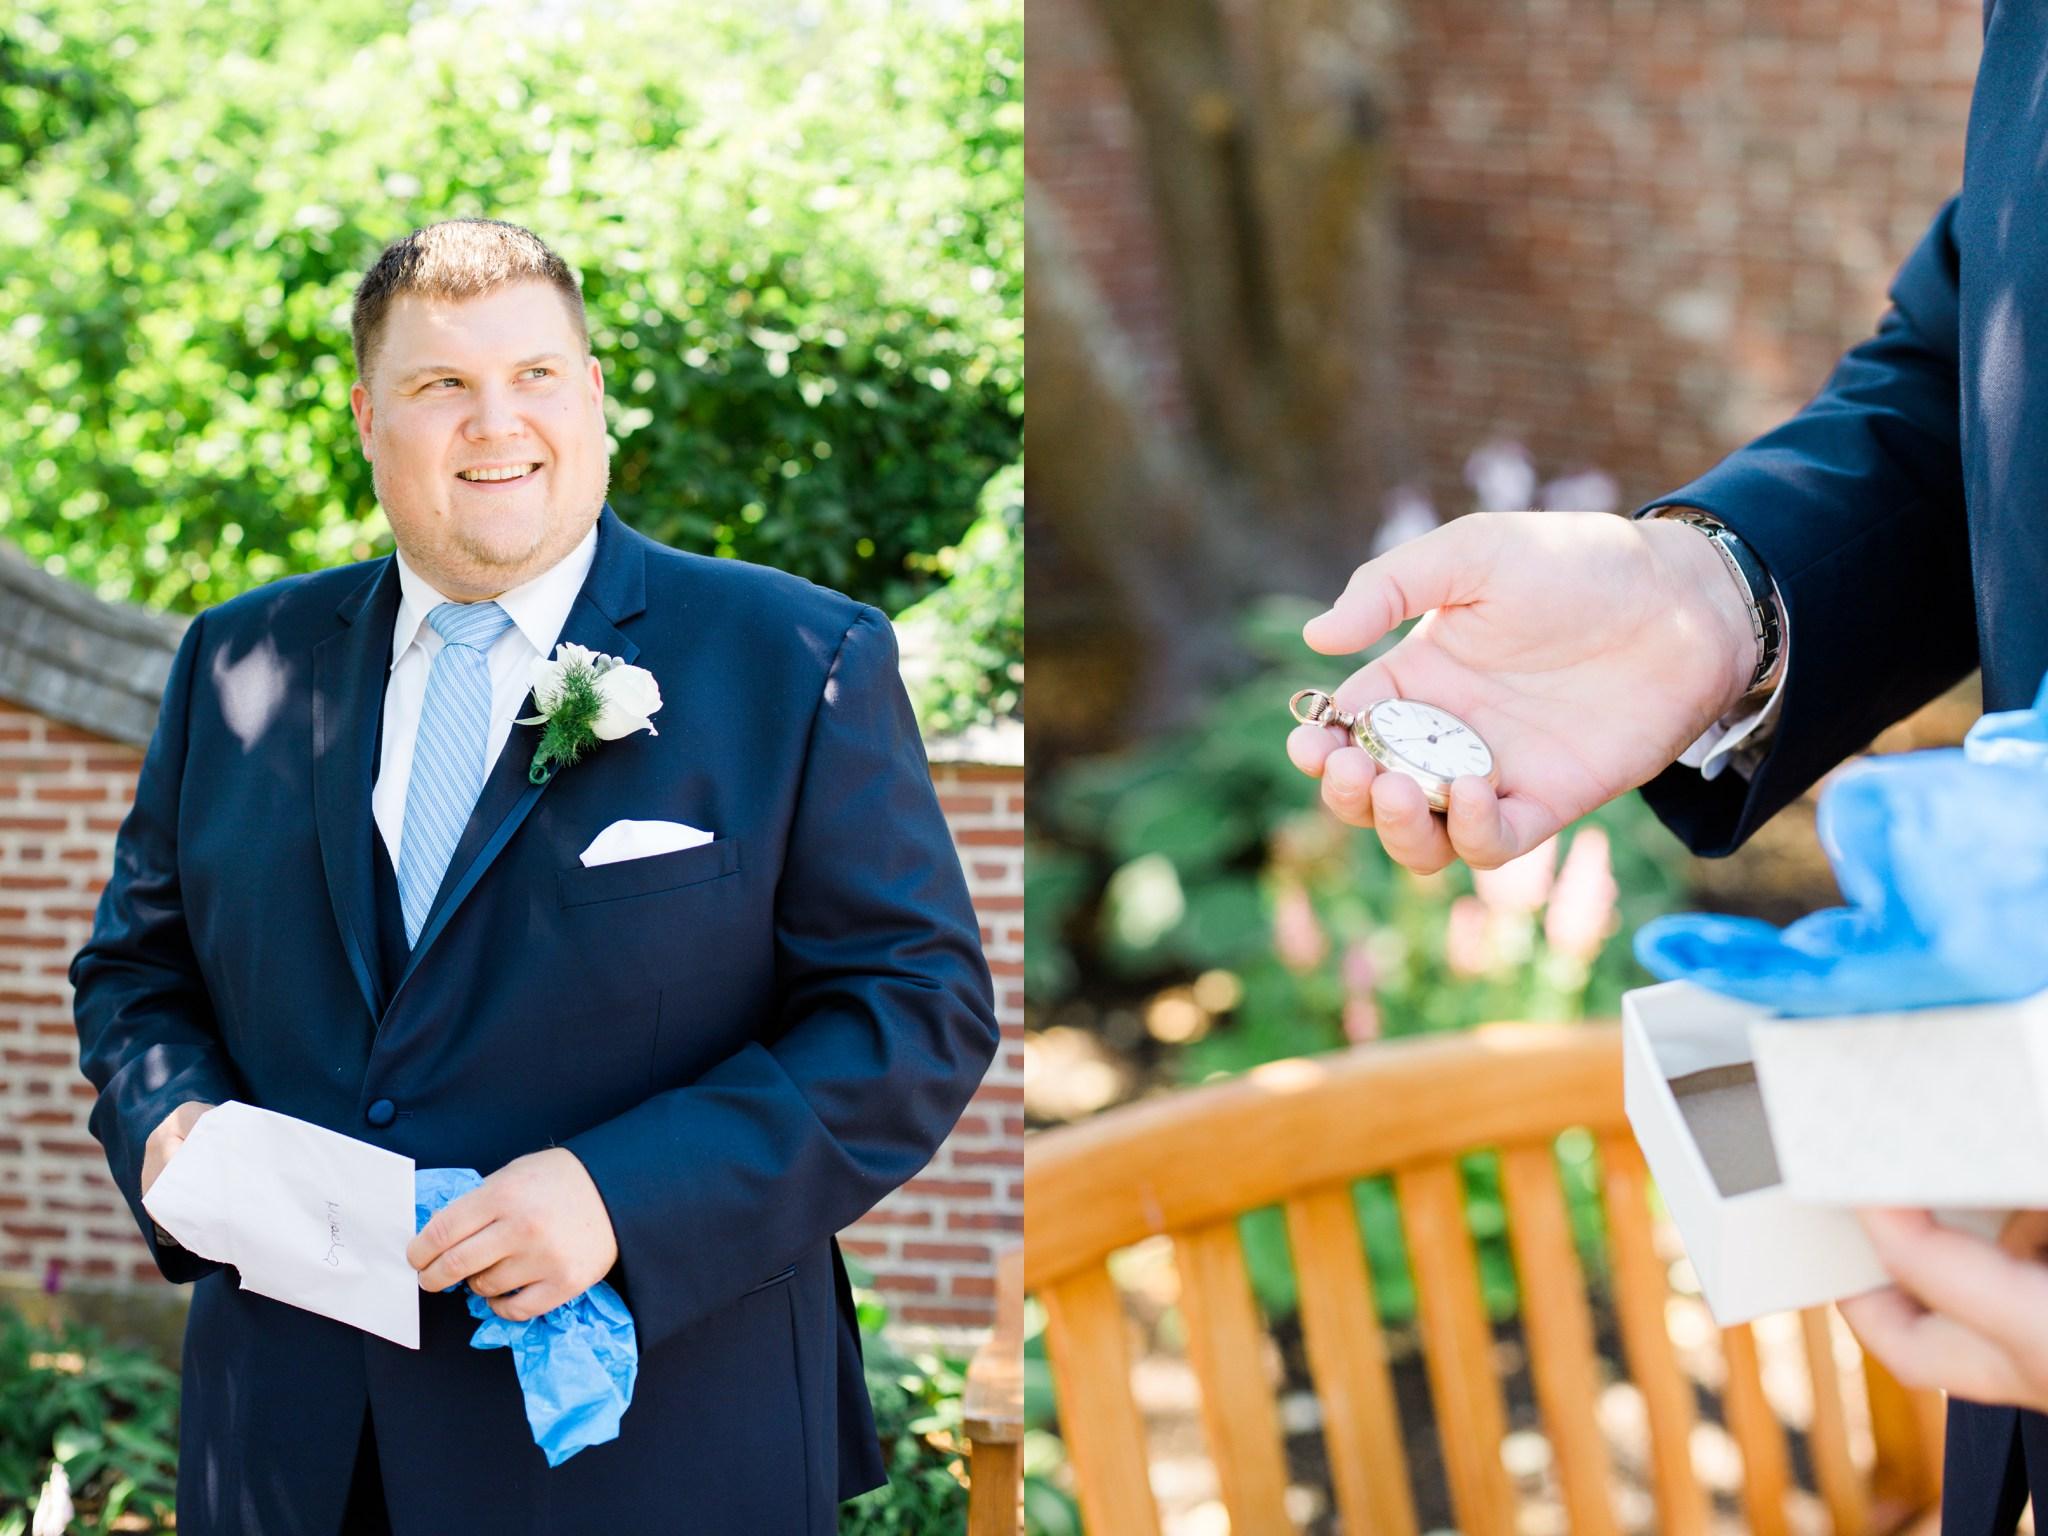 misselwood_endicott_college_wedding_photos_00018.JPG